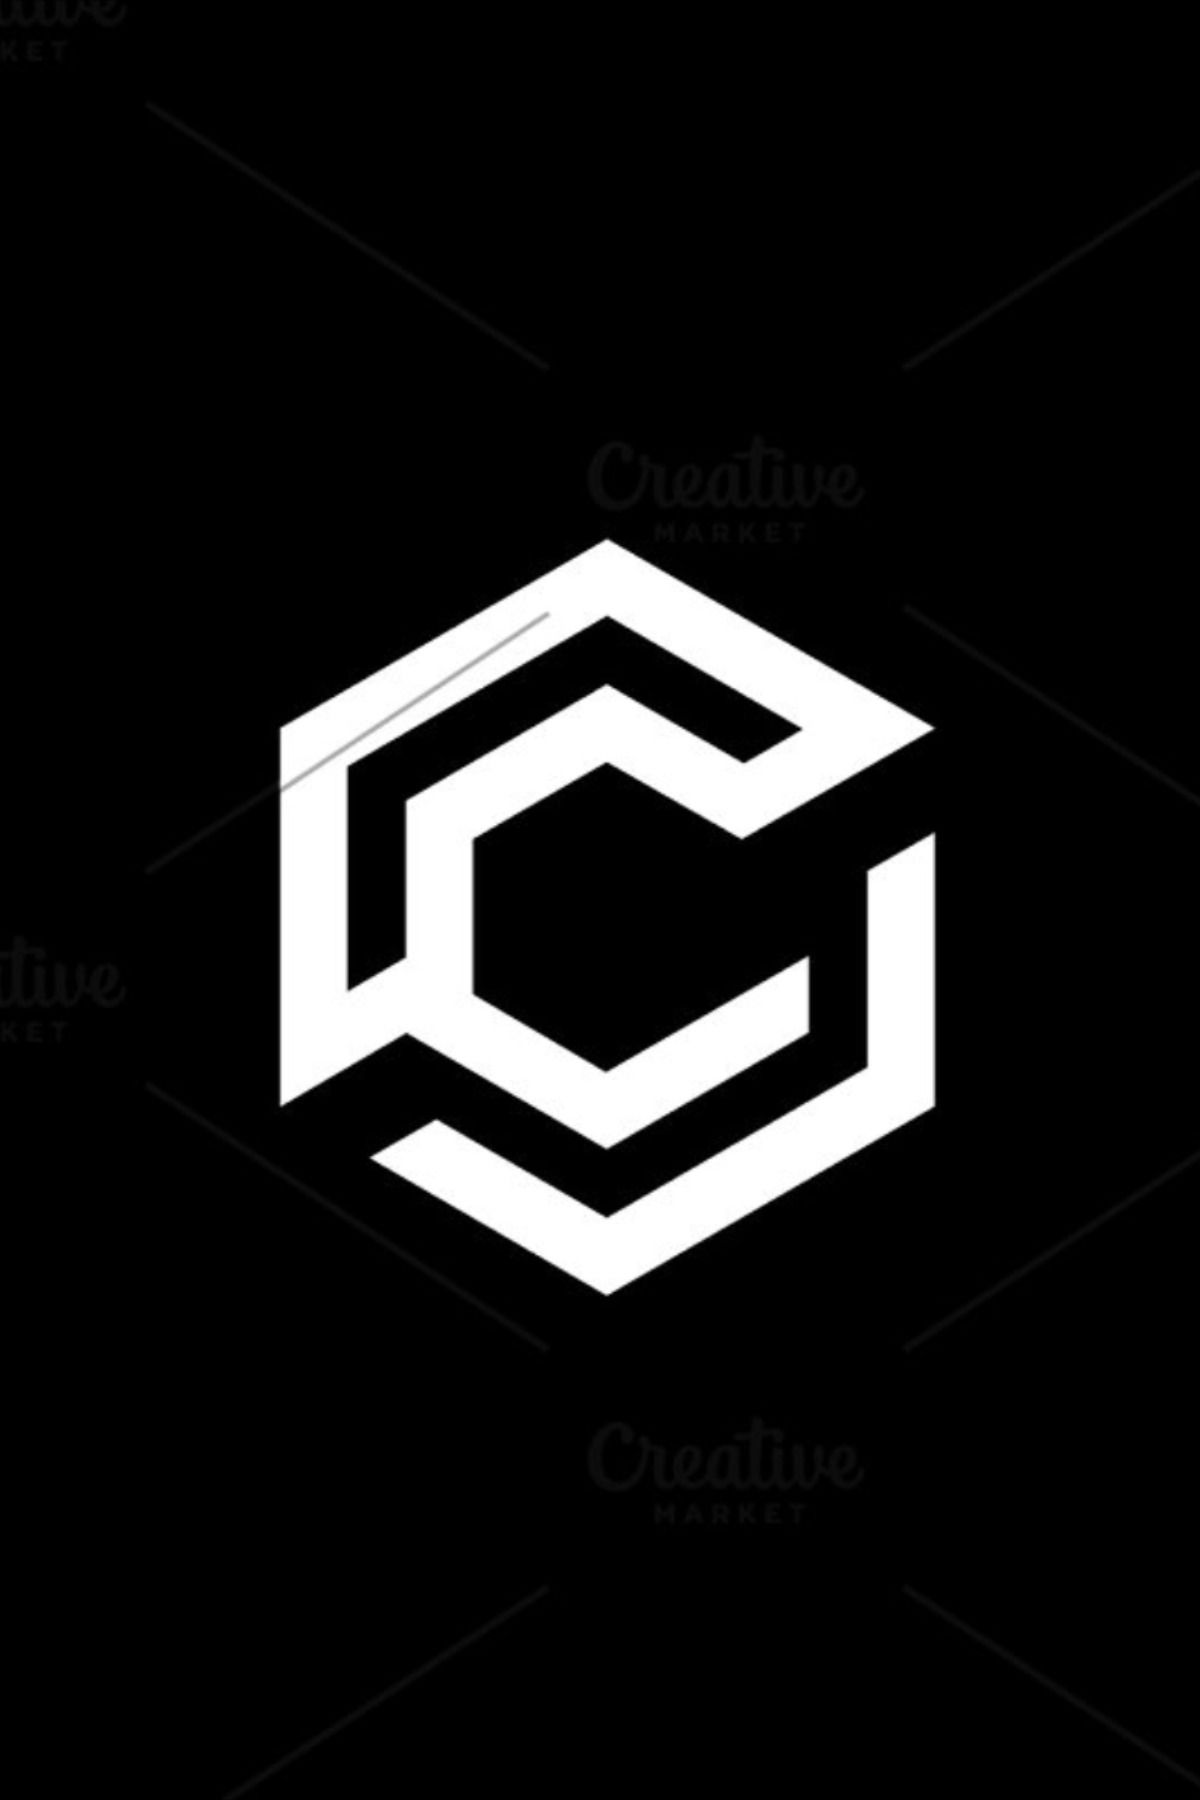 Abstract Letter C Vector Logo Icon Letter Logo Design Logo Design Typography Geometric Logo Design